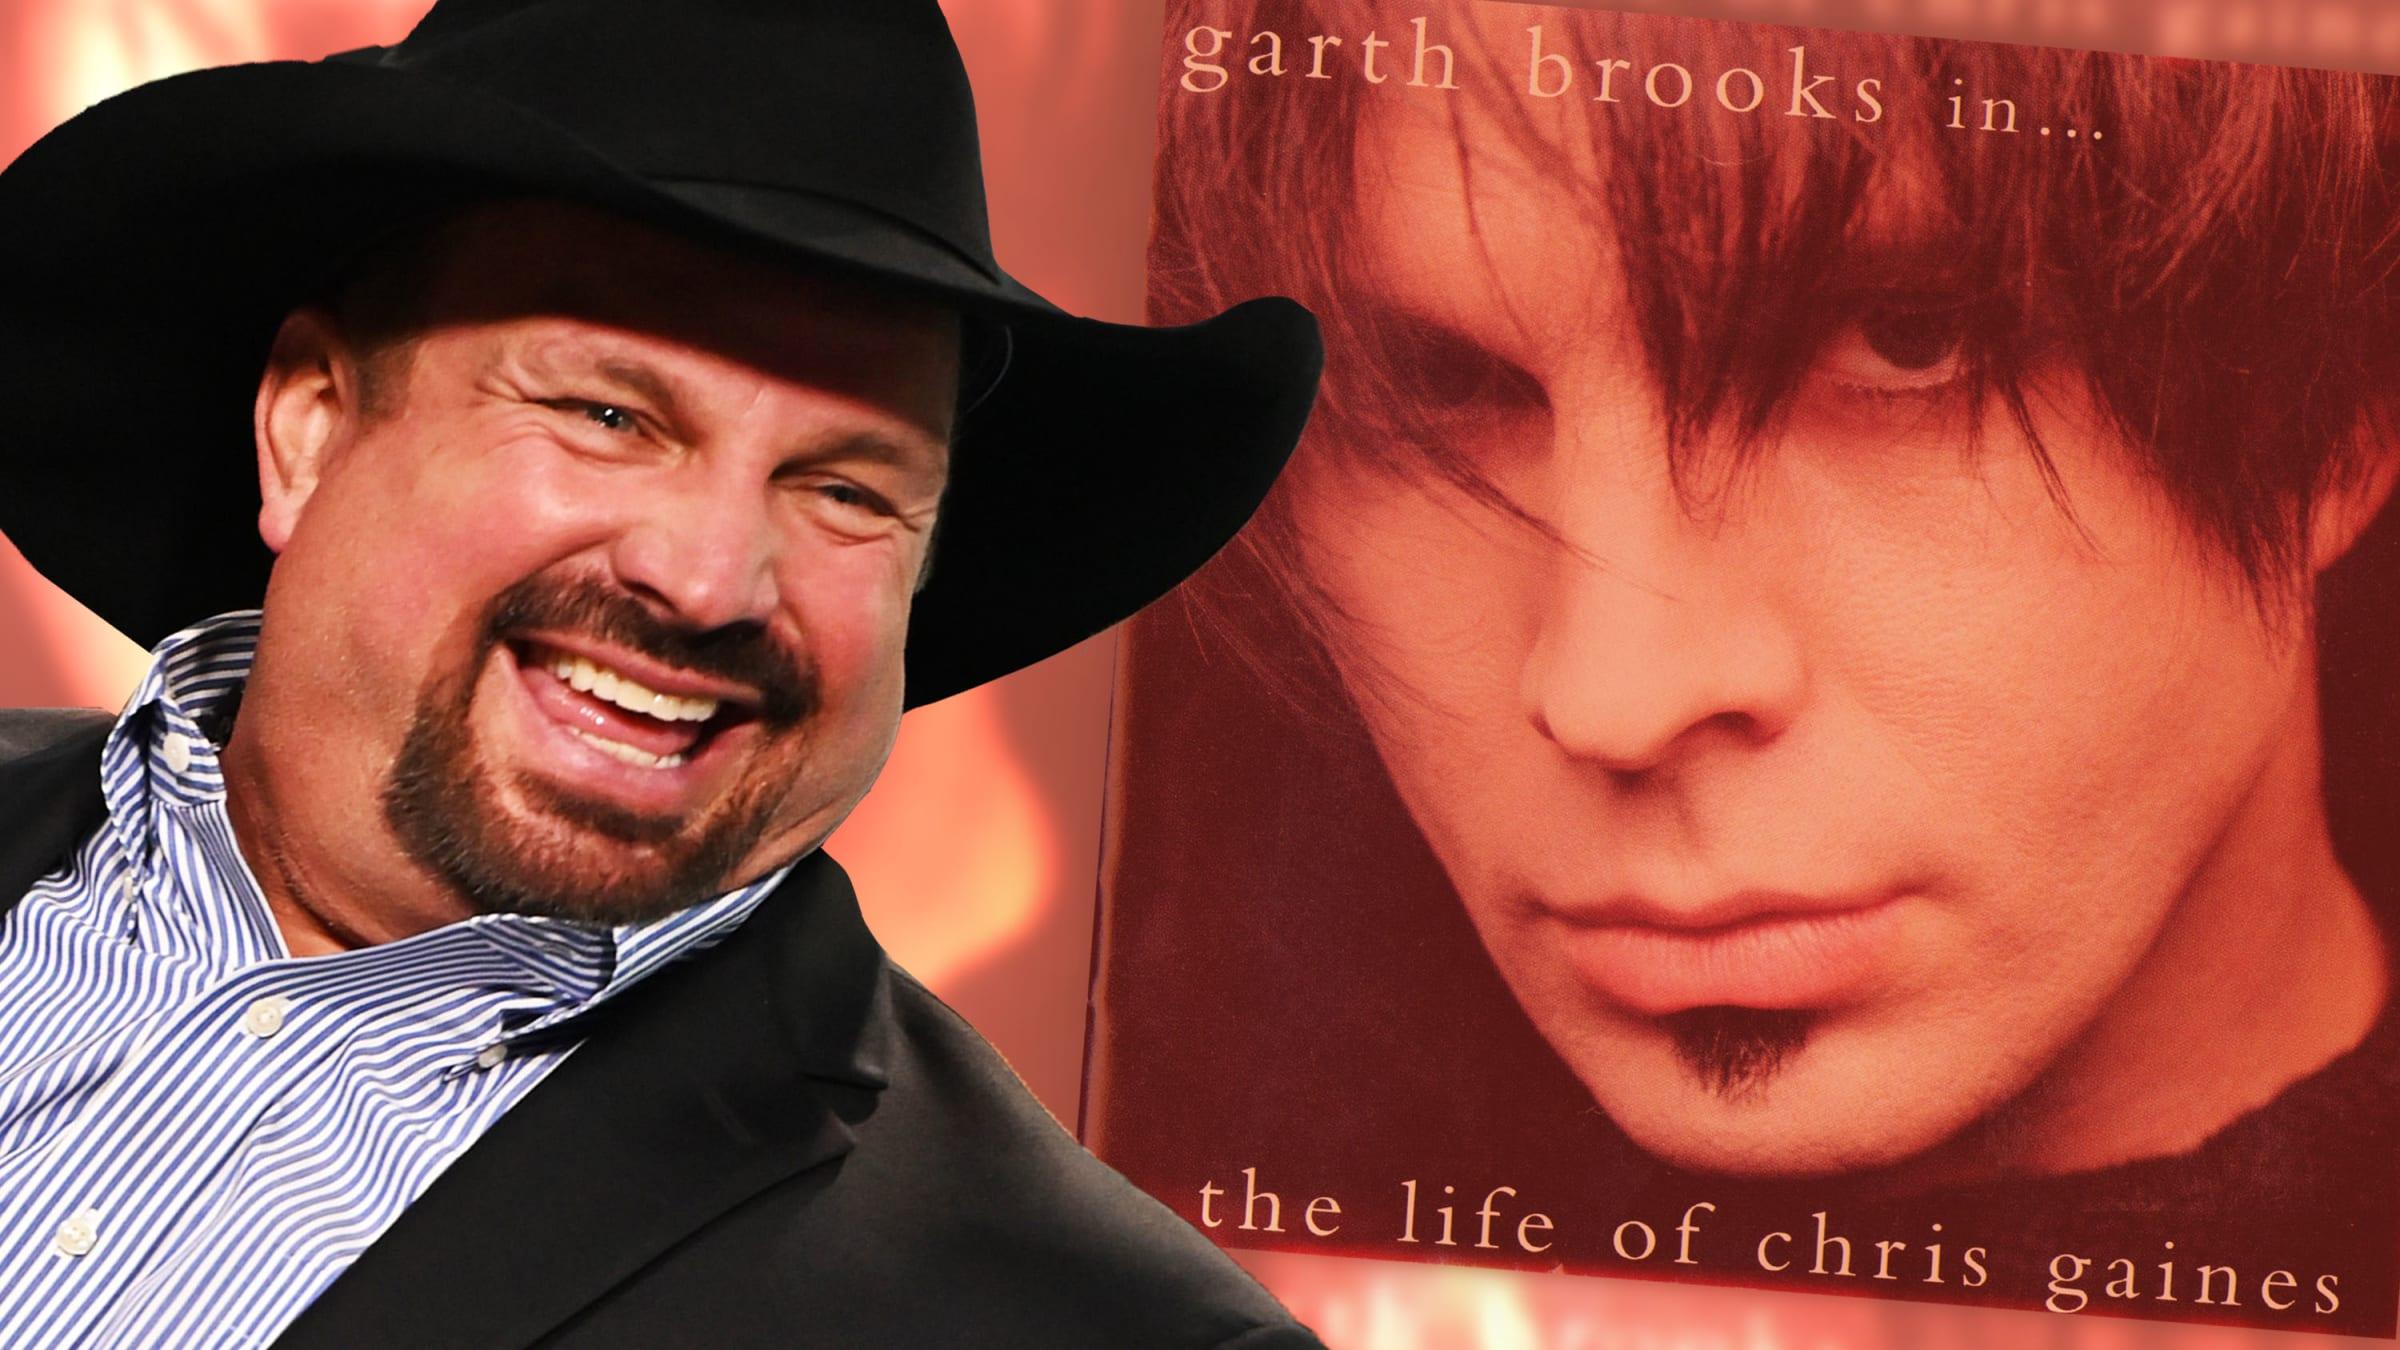 Remembering Chris Gaines Garth Brooks Sex Addicted 90s Alter Ego